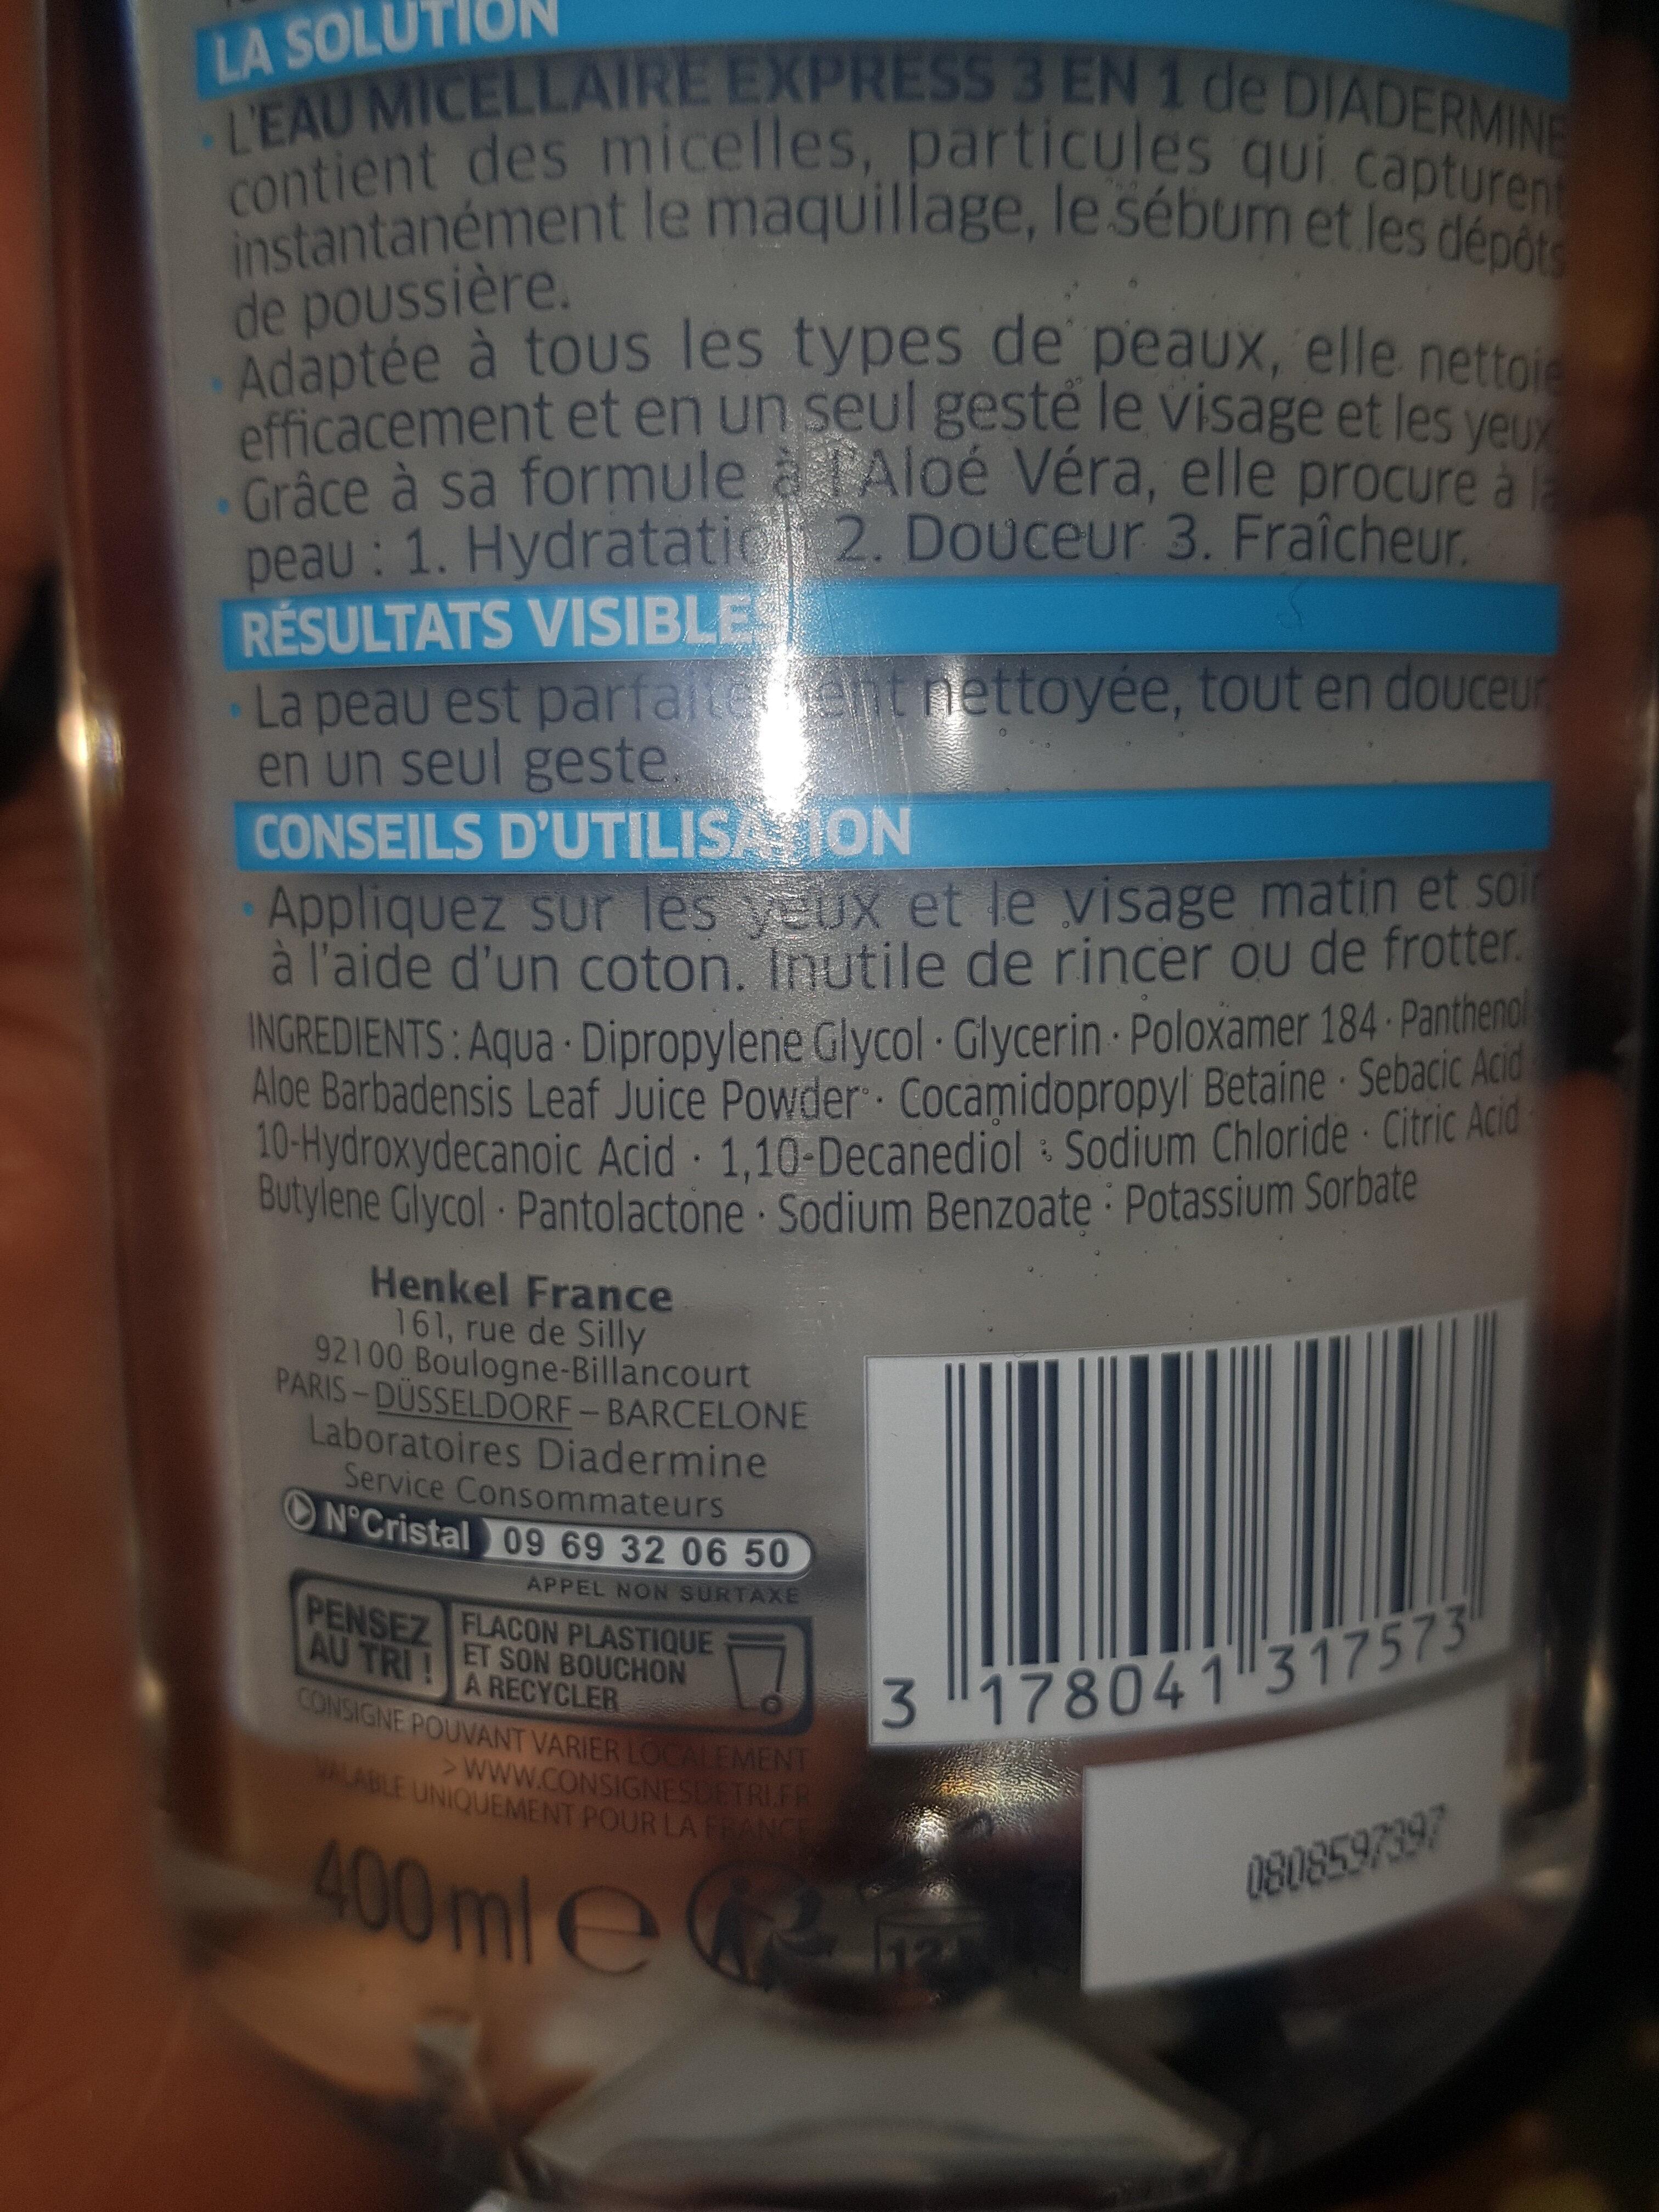 eau micellaire express 3 en 1 - Ingredients